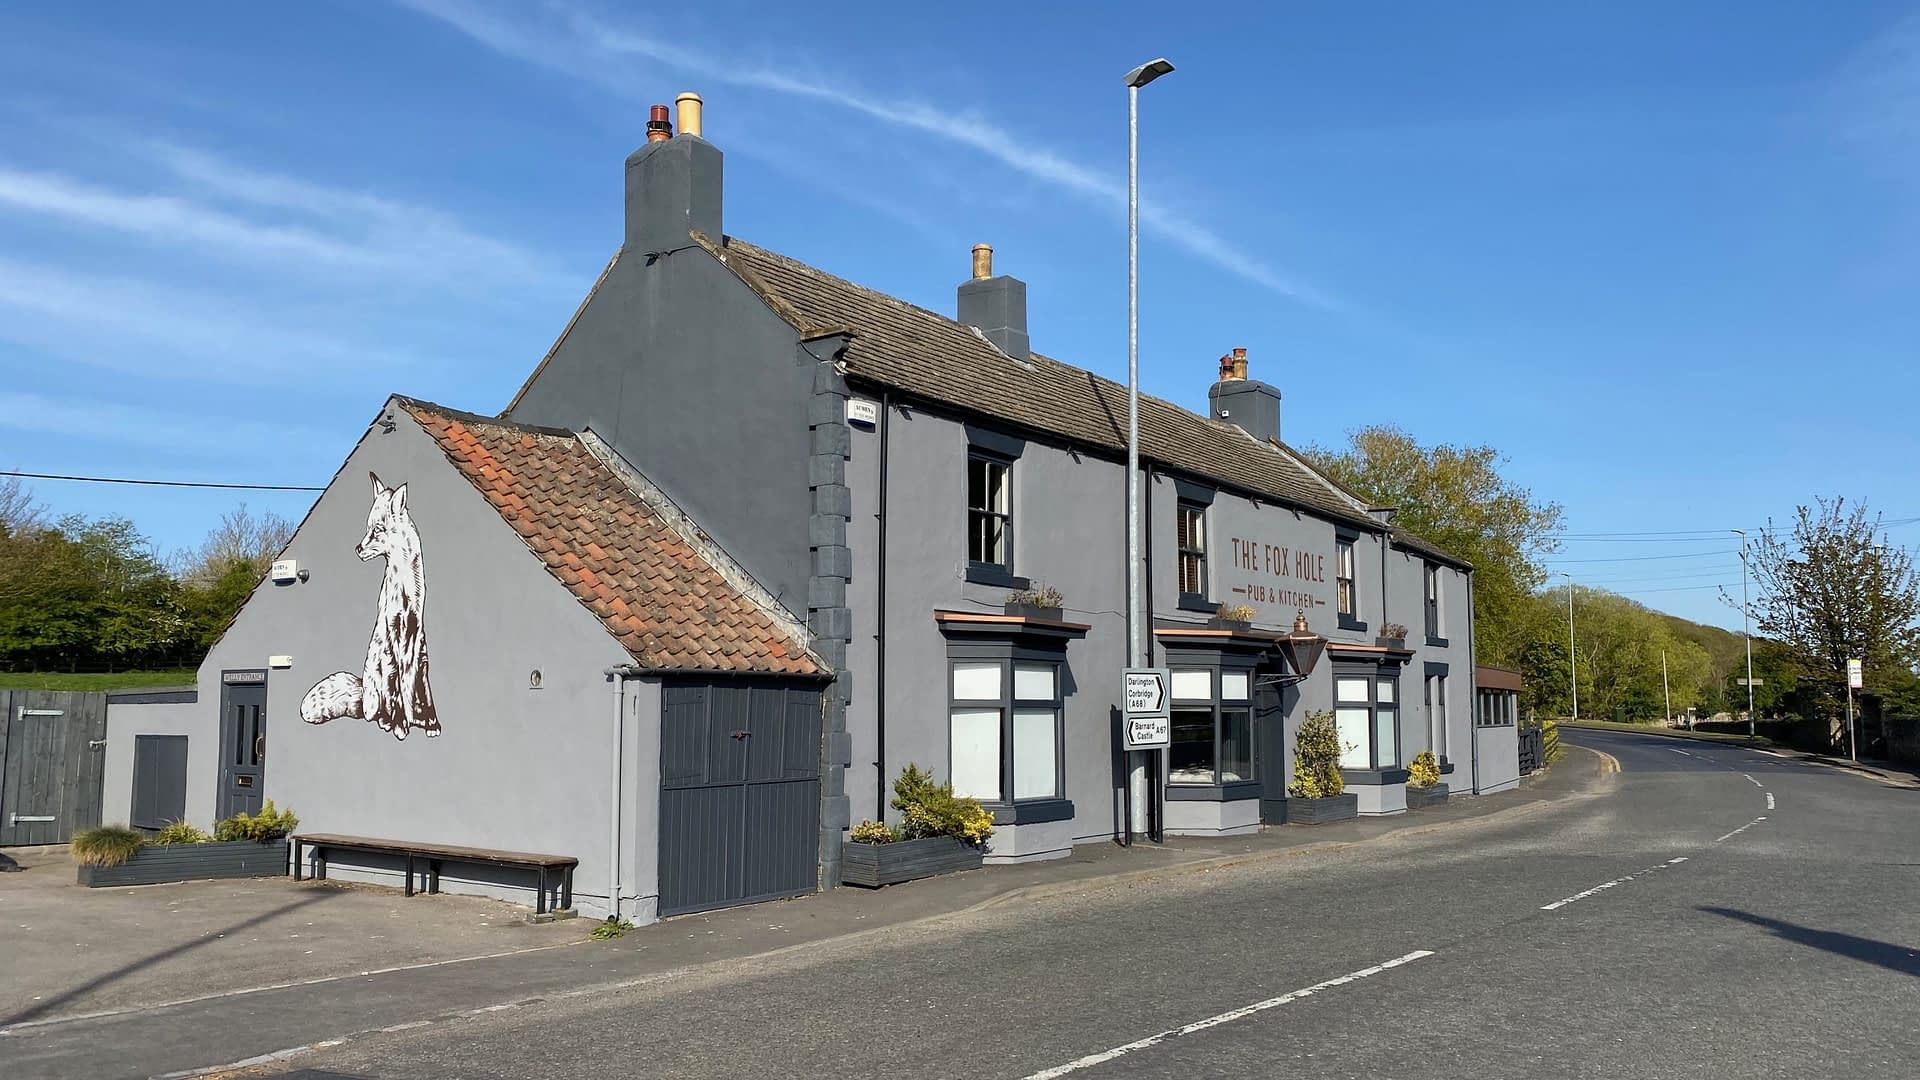 The Fox Hole Pub